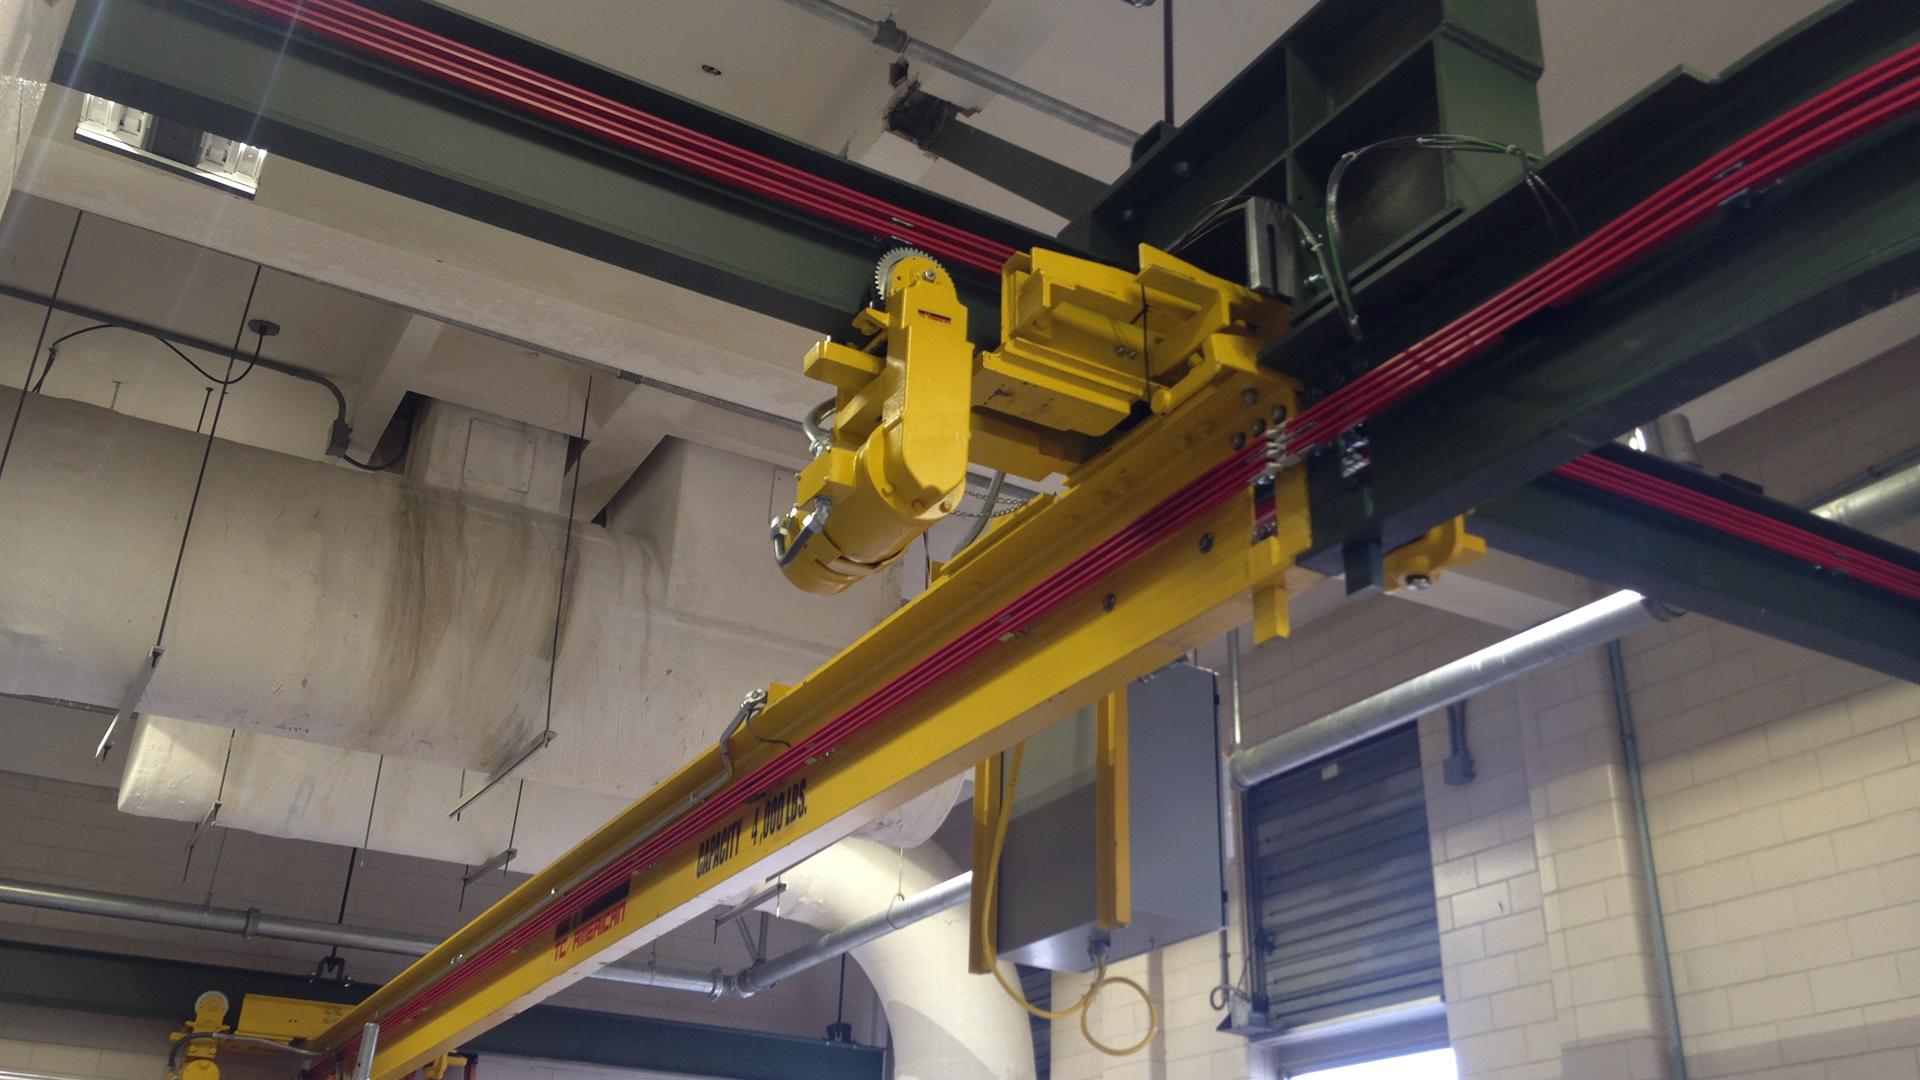 Mass Crane and Hoist - Interlocking Crane and Curved